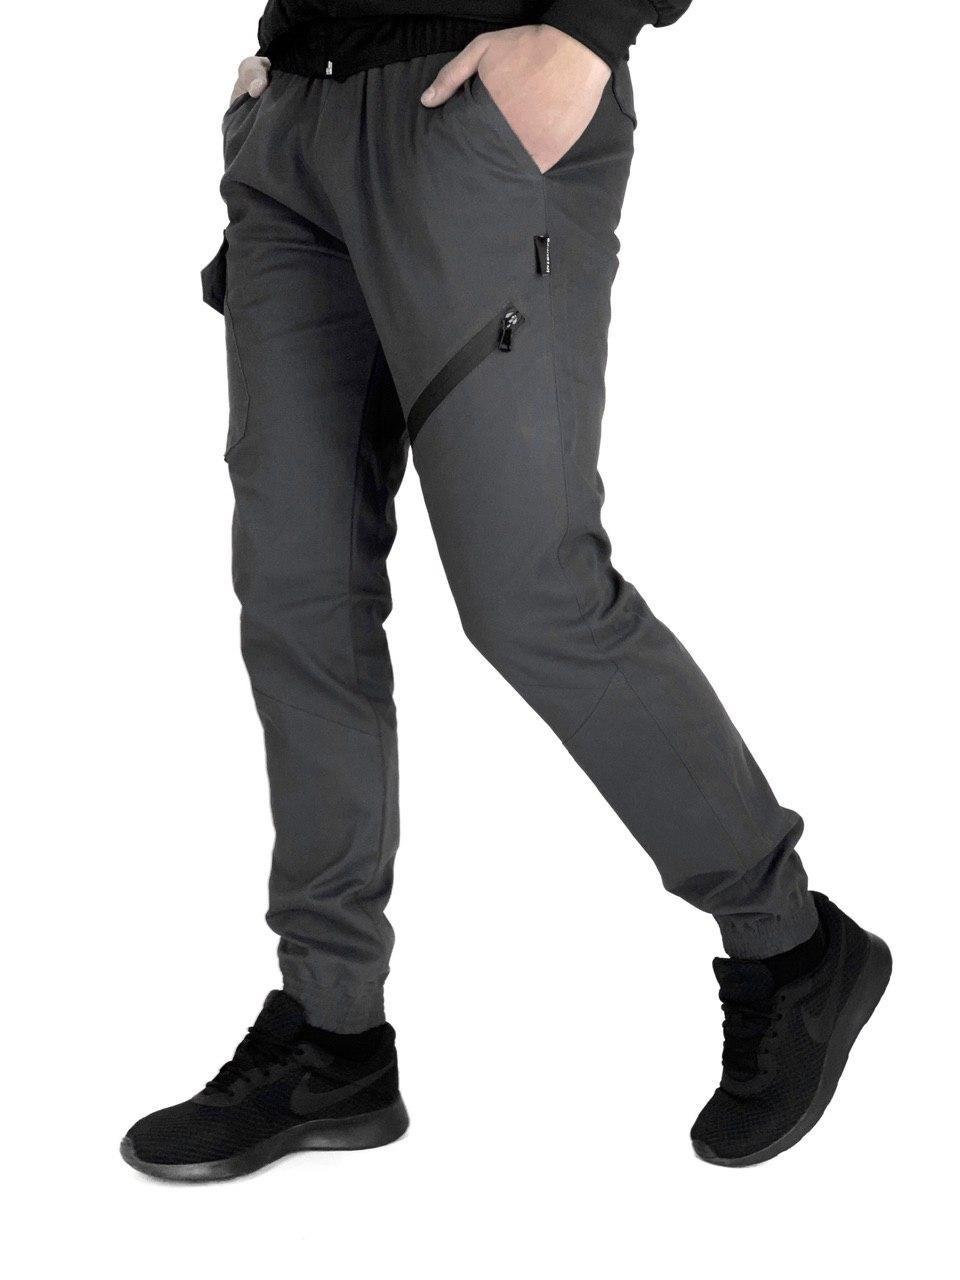 Мужские штаны Intruder Fast Traveller серые